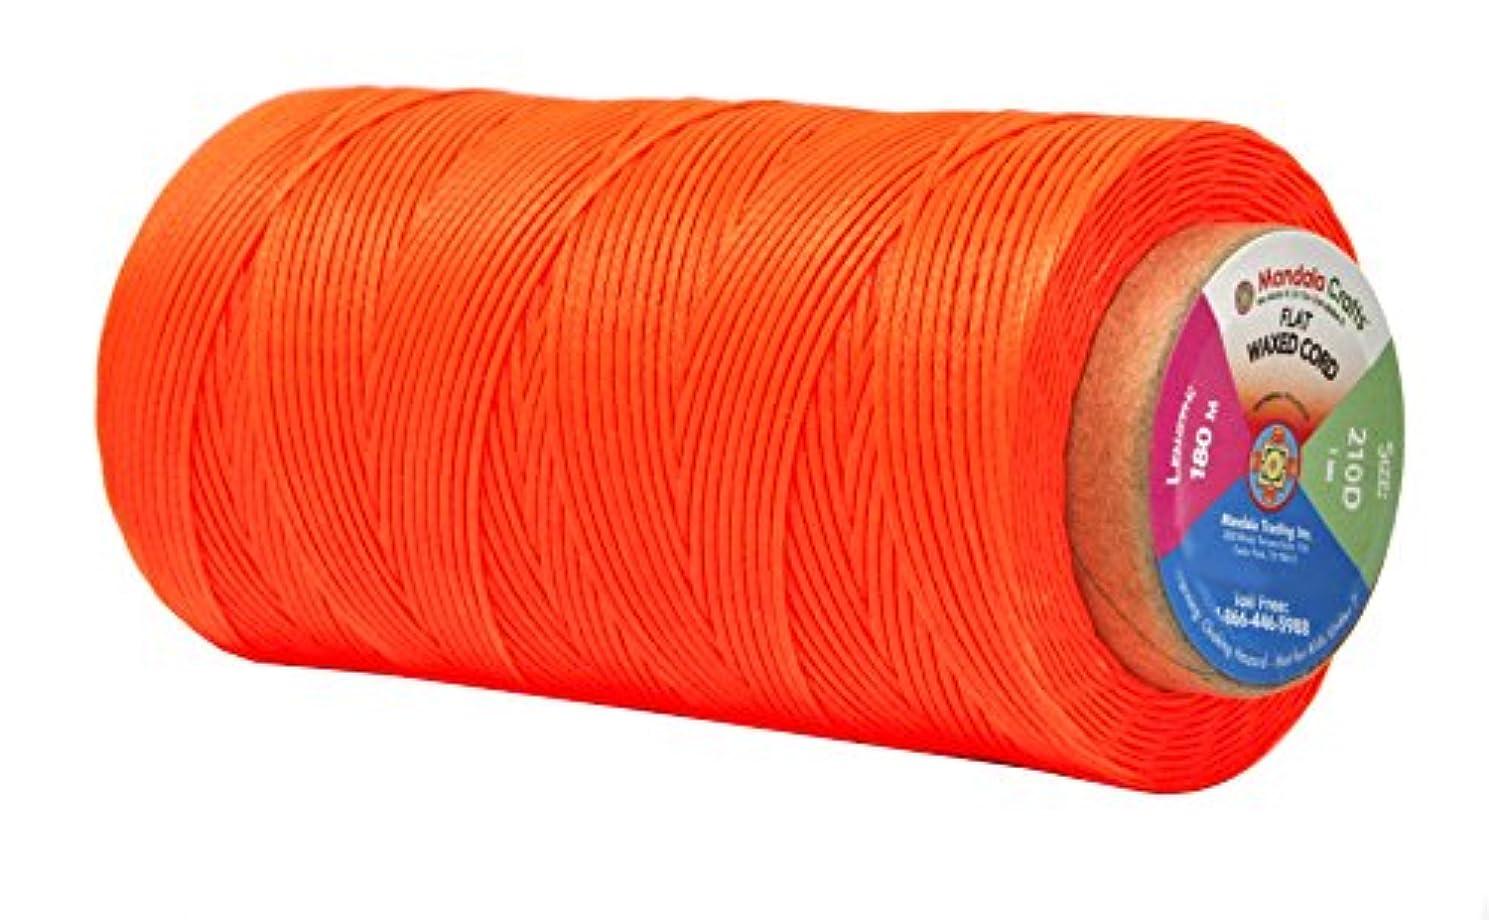 Mandala Crafts 150D 210D 0.8mm 1mm Leather Sewing Stitching Flat Waxed Thread String Cord (210D 1mm 180M, Orange)